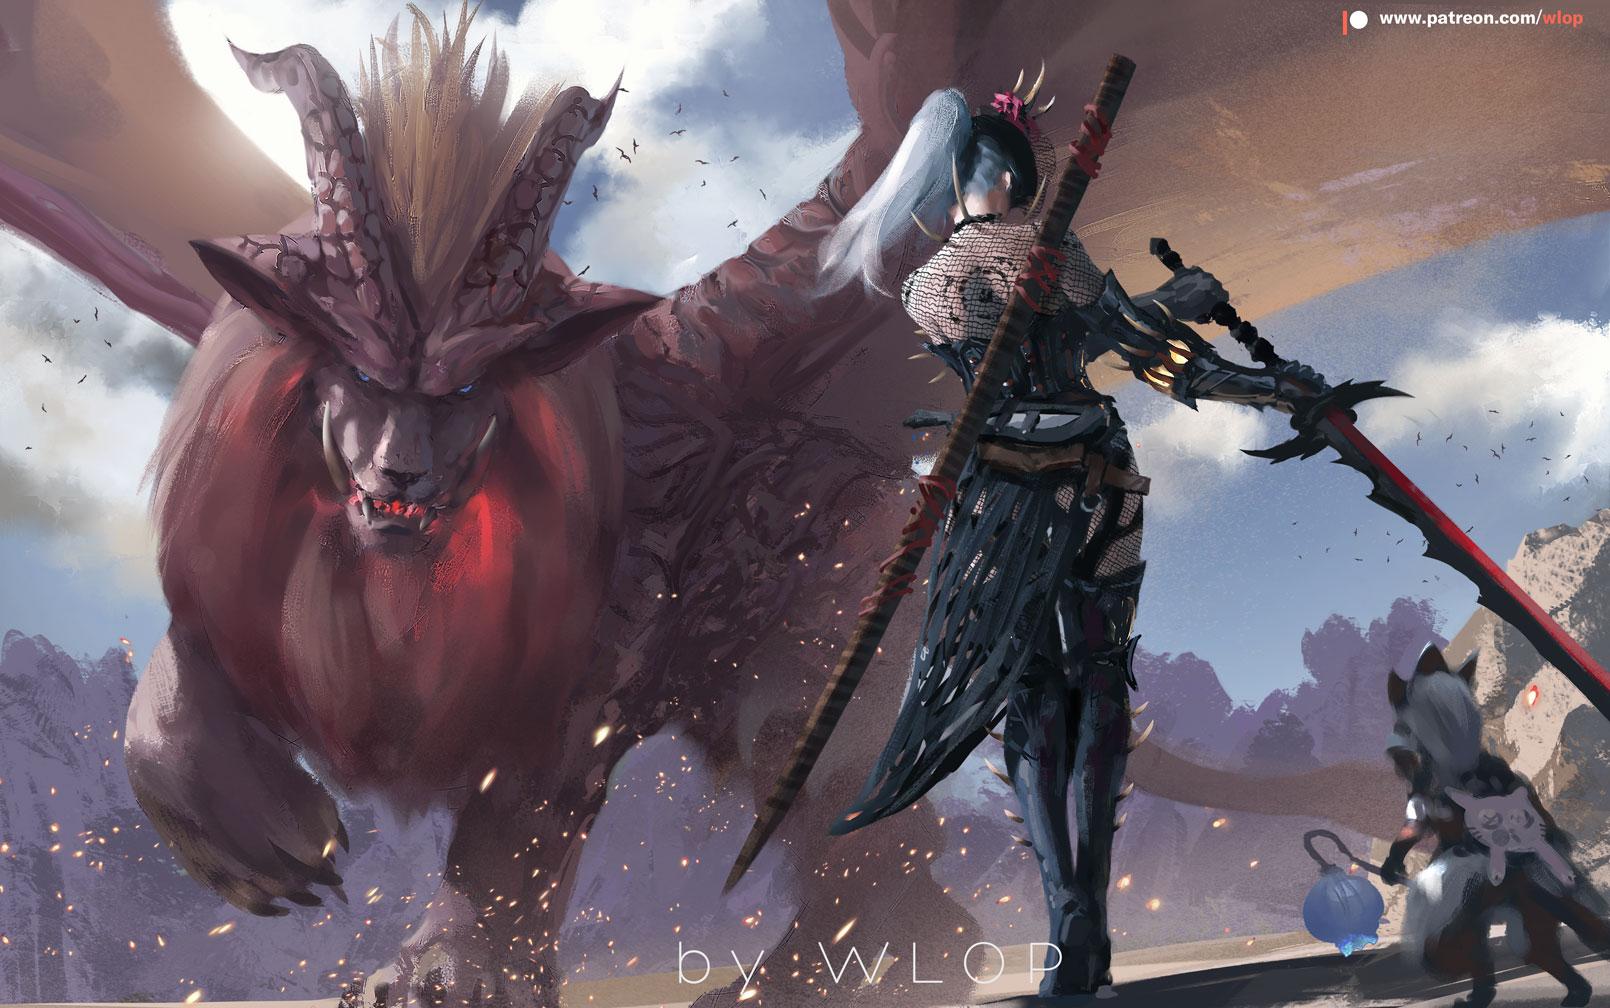 Monster Hunter By Wlop On Deviantart